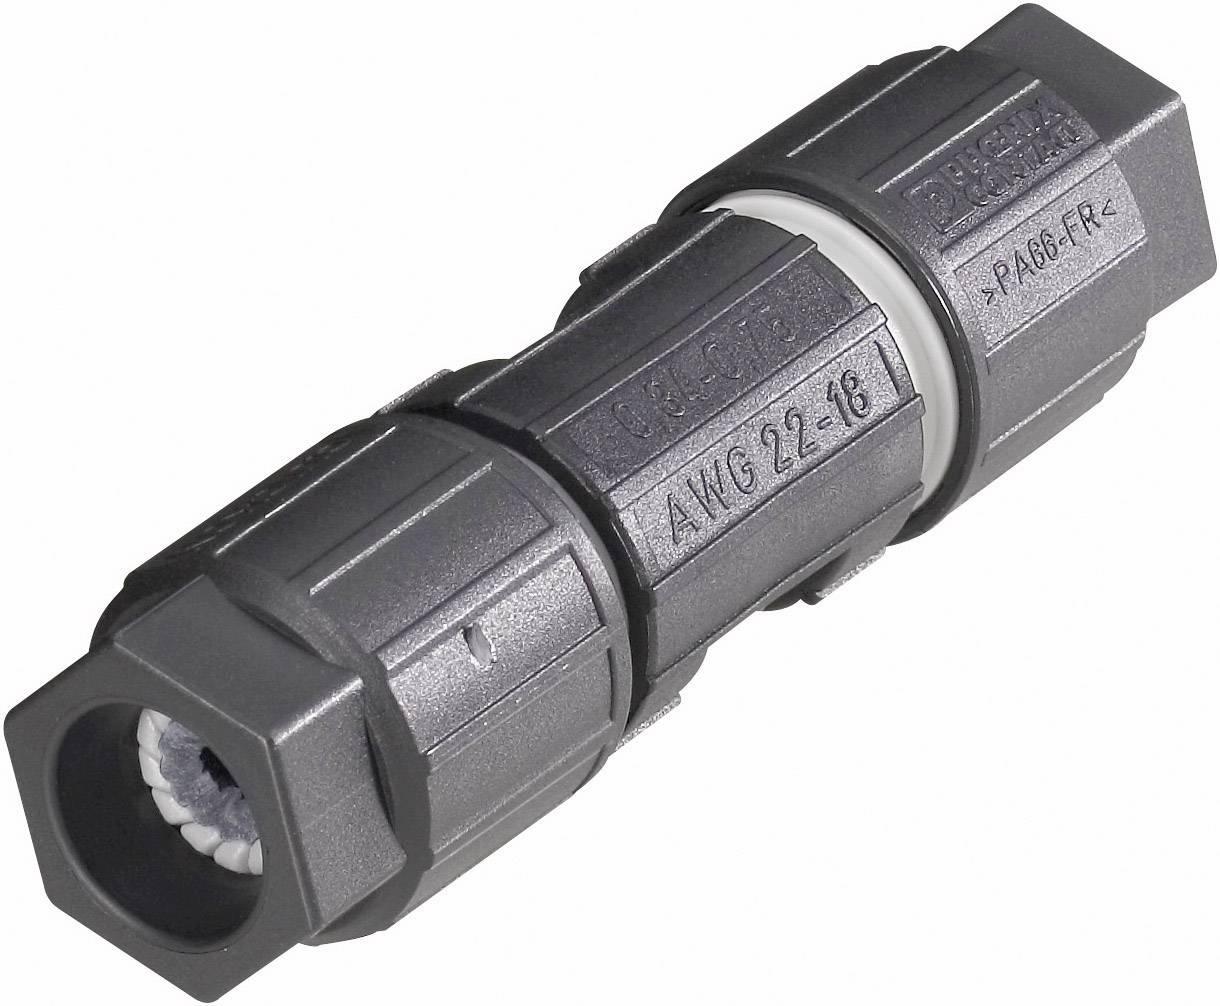 Kabelové spojky QUICKON-ONE, 0.75 - 1.5 mm²